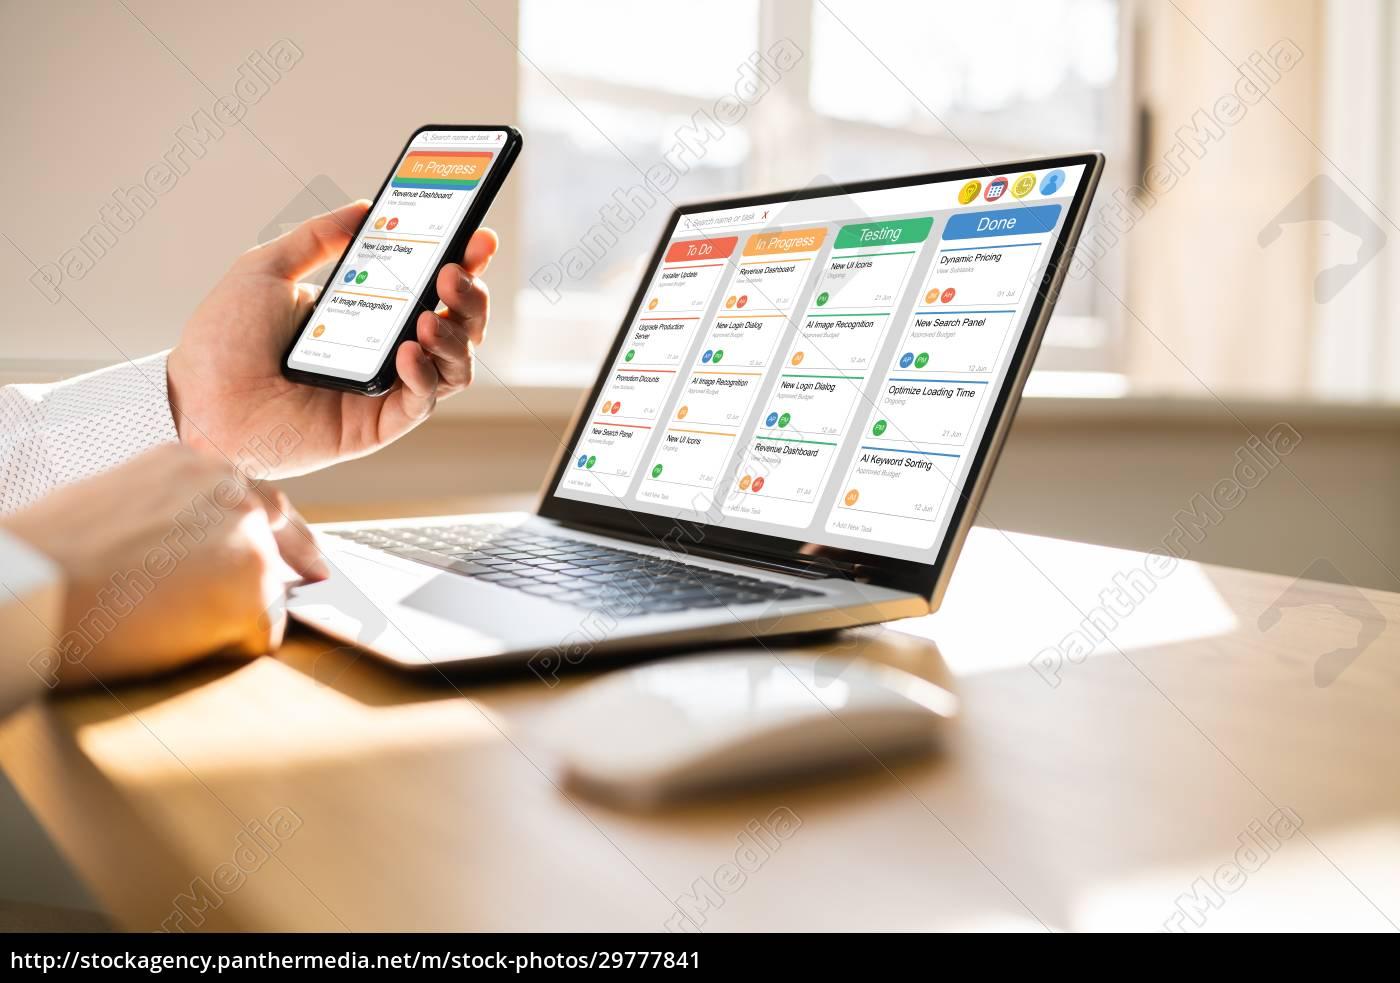 kanban, scrum, zeitplan, board, plan, app - 29777841